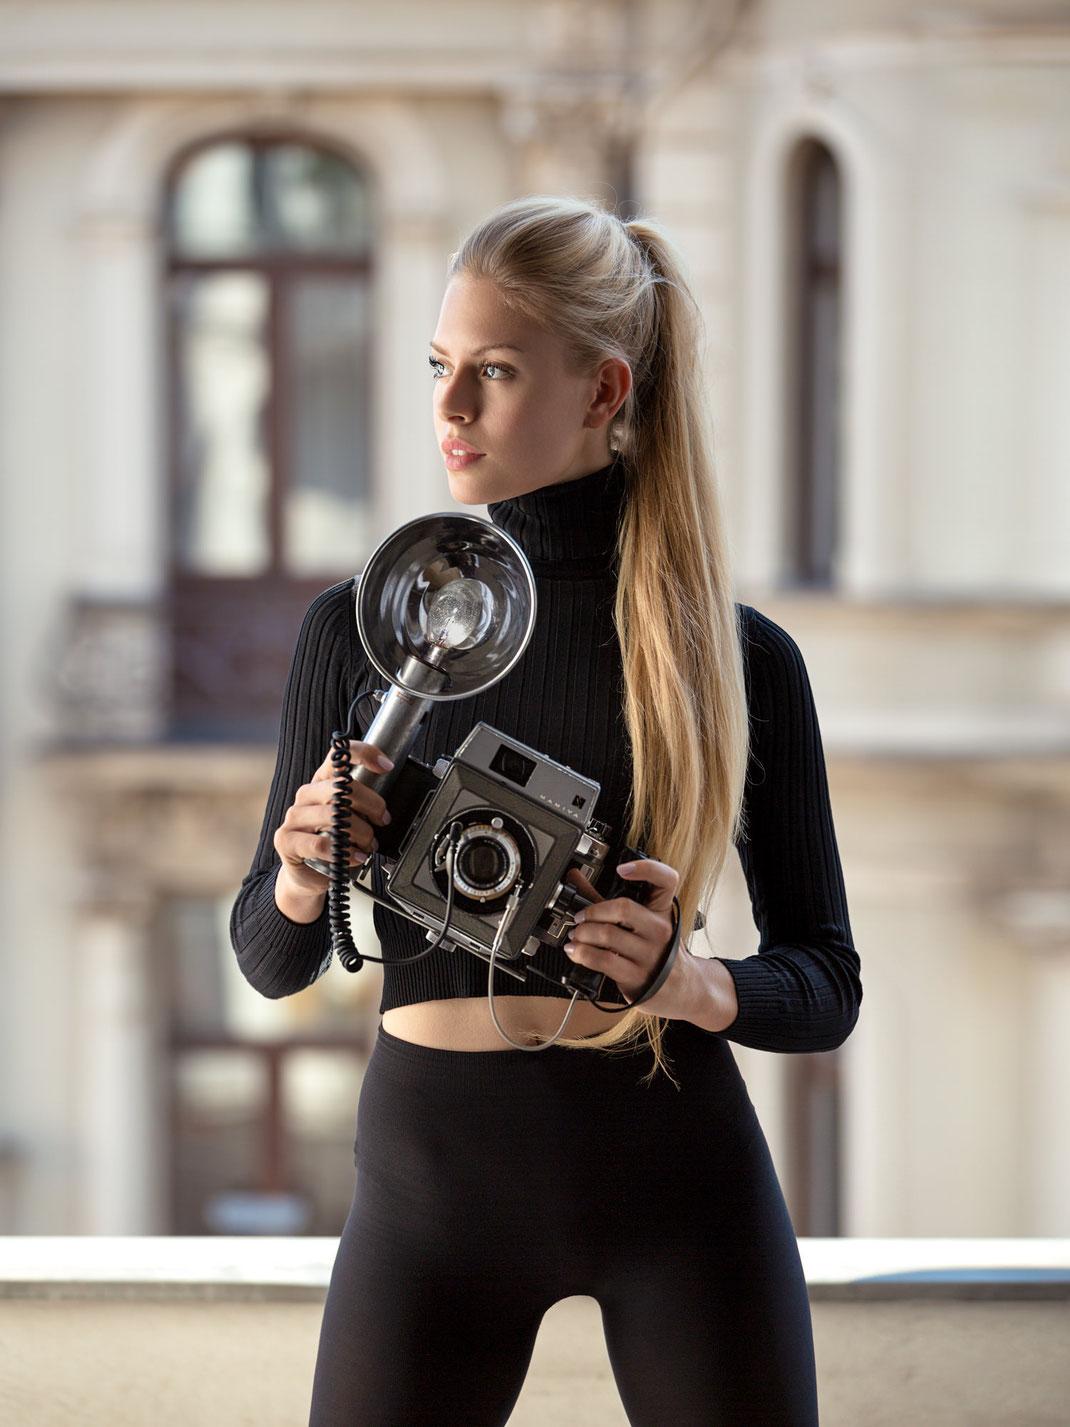 Two Beauties - Lisa & Mamiya Press 23 - Markus Hertzsch - Camera - Girl